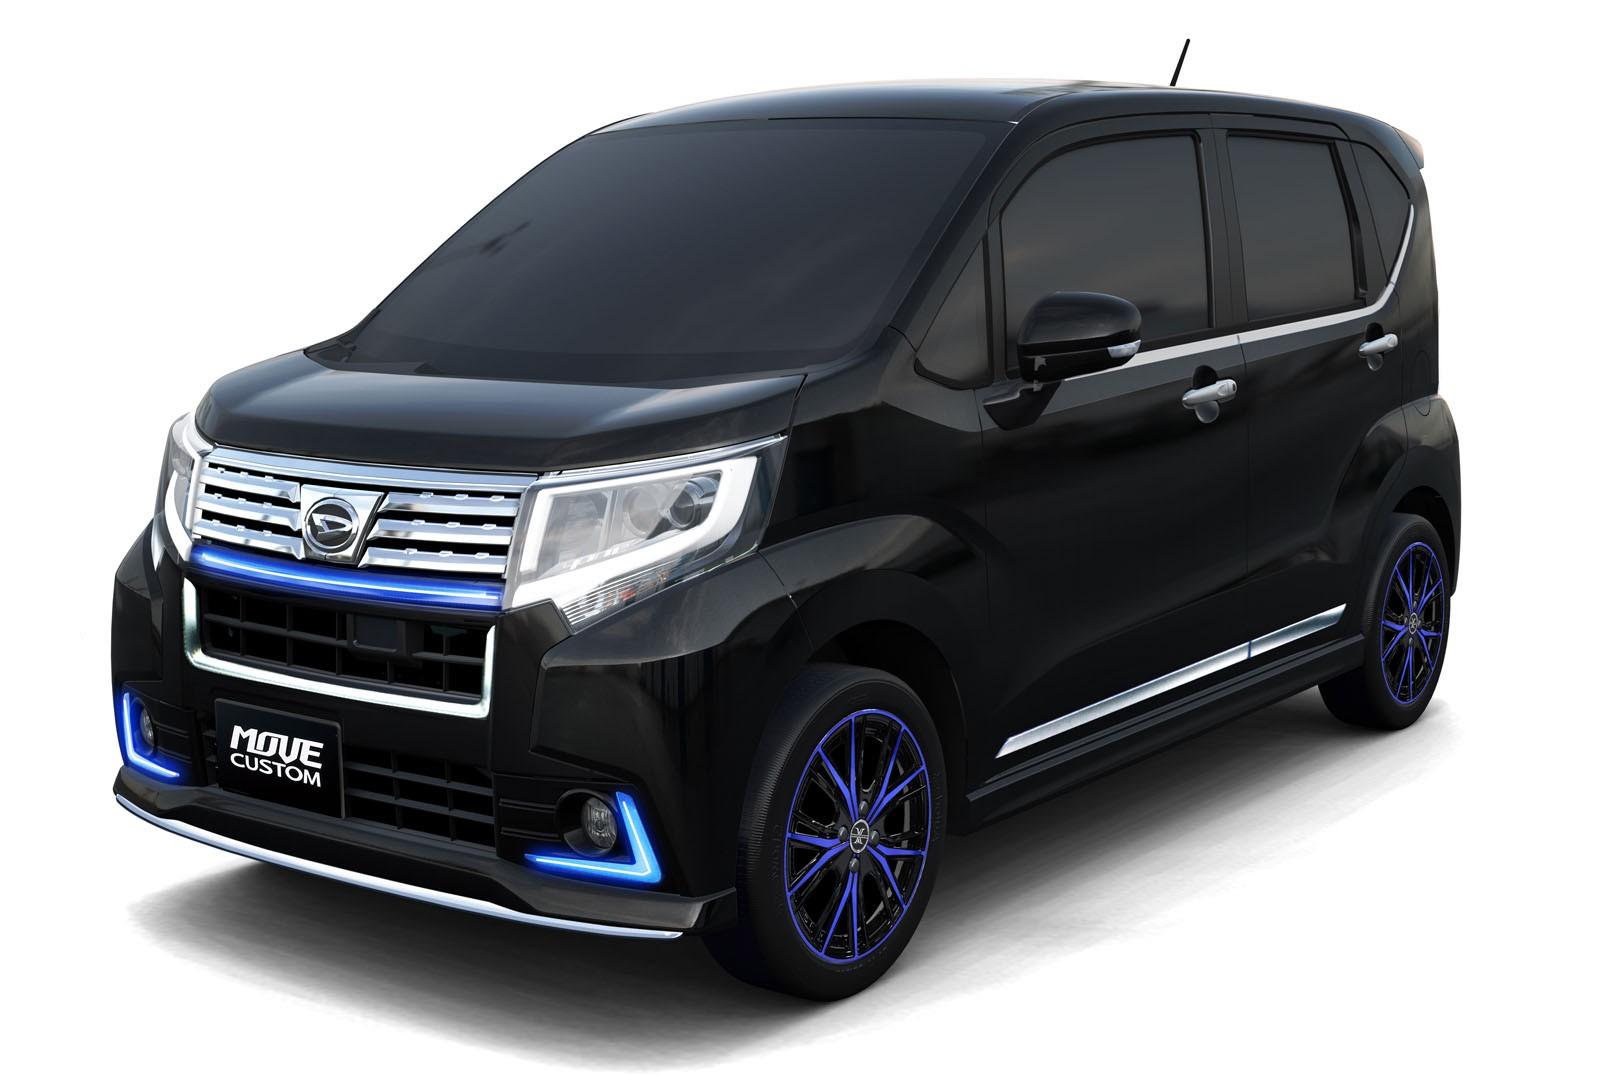 Daihatsu Exhibits 11 Concept Cars at the Tokyo Auto Salon ...